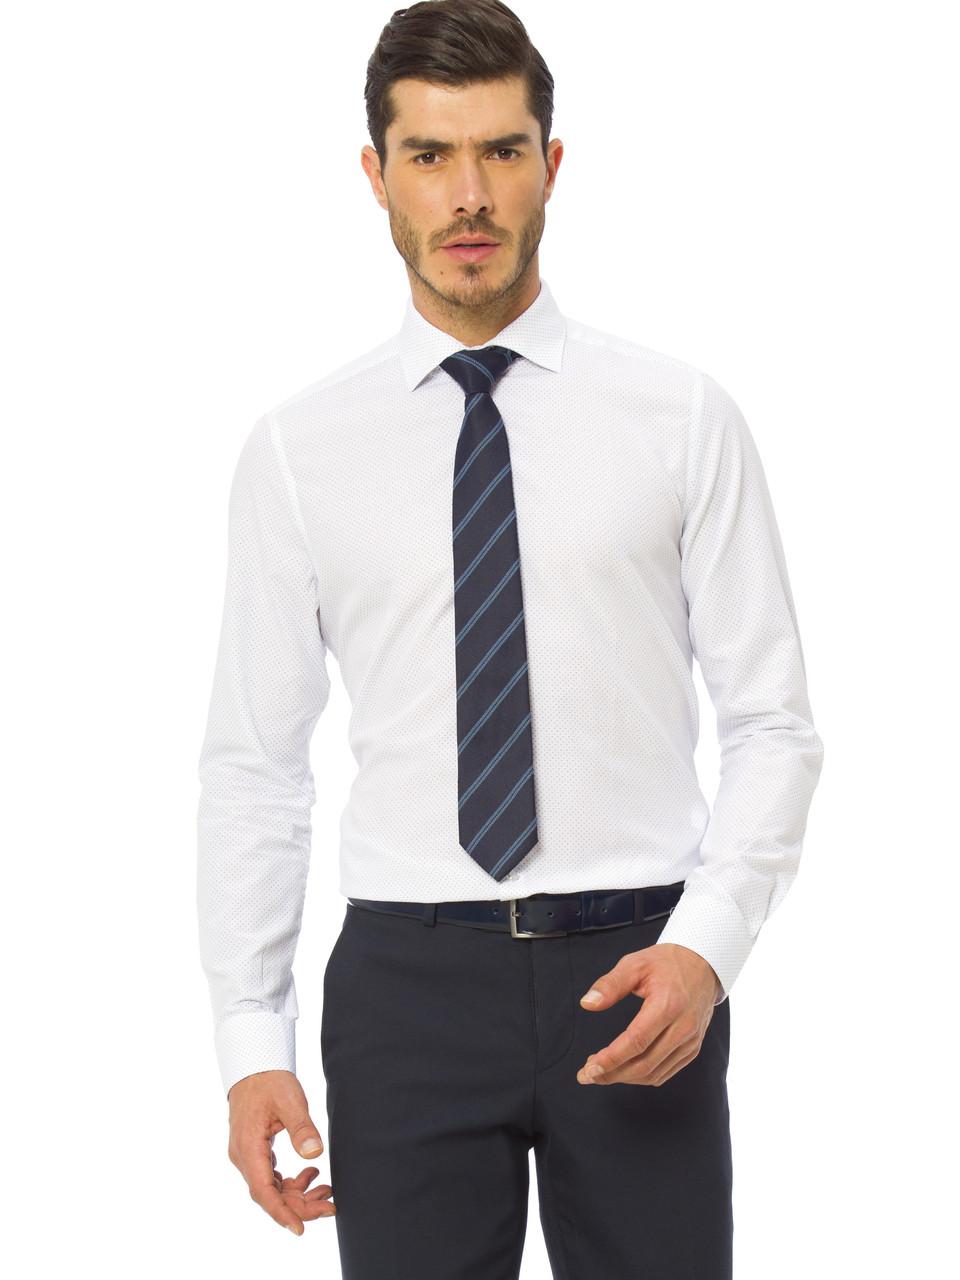 Белая мужская рубашка LC Waikiki/ЛС Вайкики в синюю точечку М